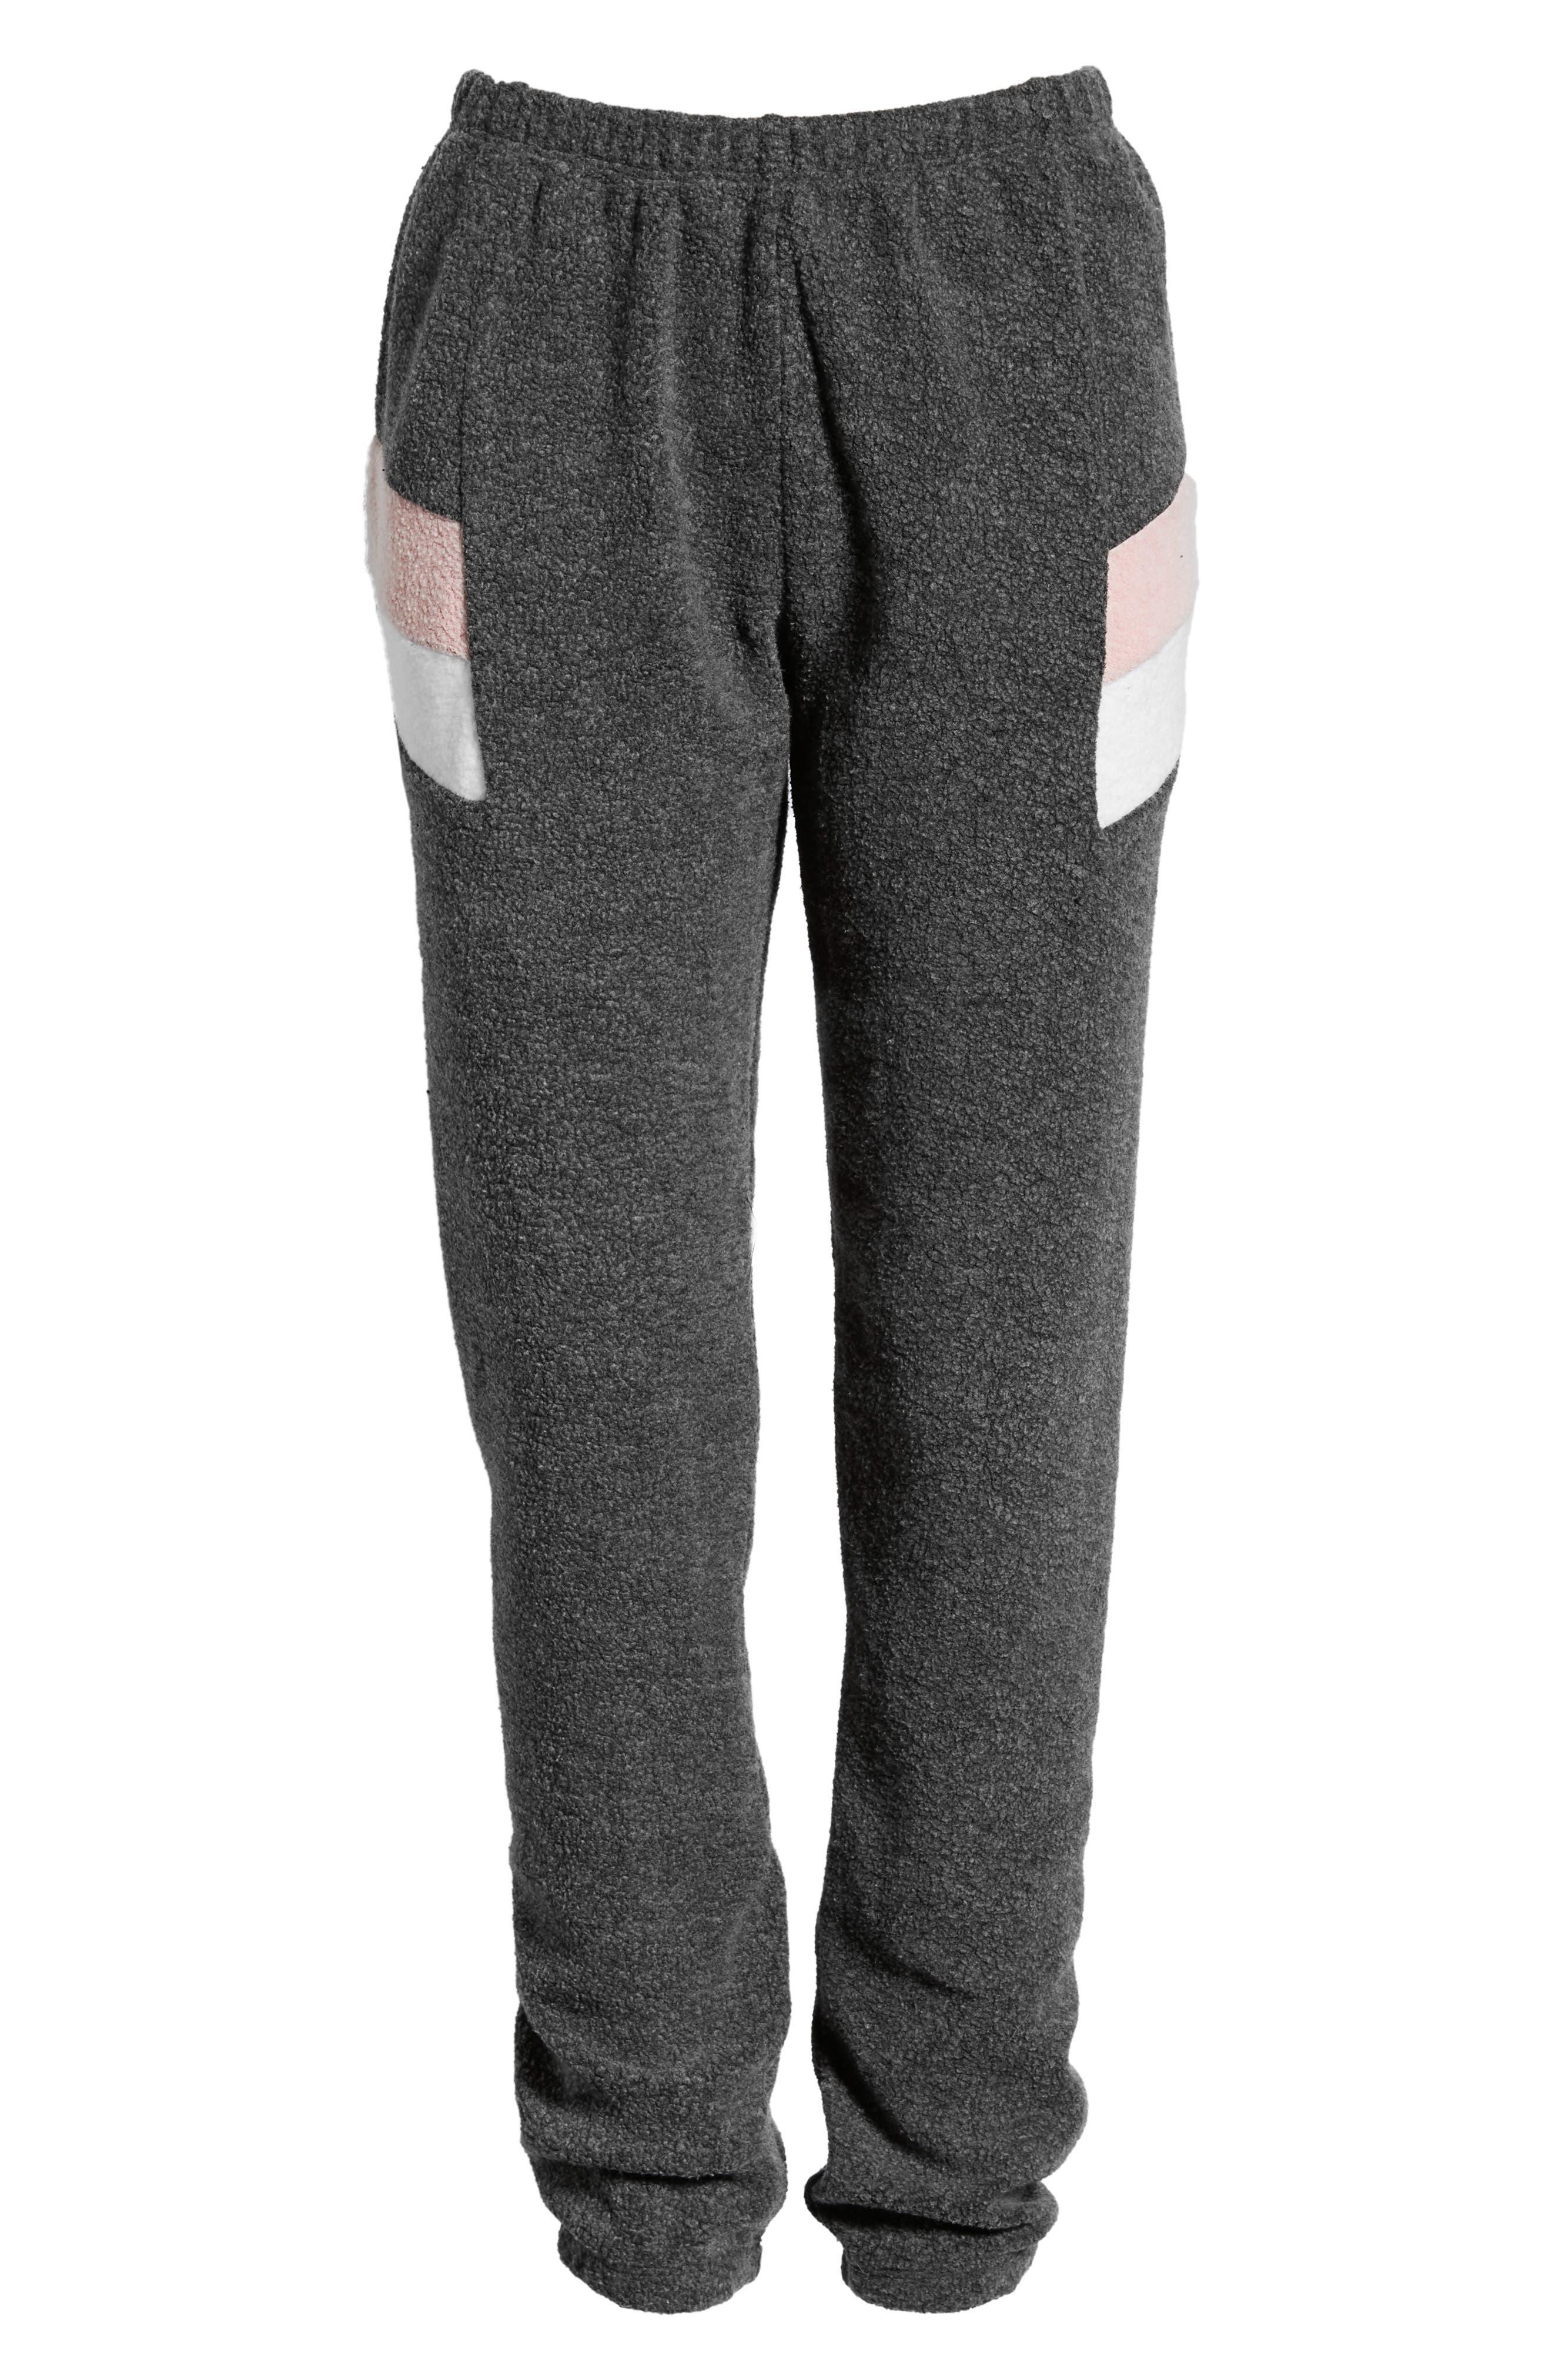 Knox Sweatpants,                             Alternate thumbnail 6, color,                             CLEAN BLACK